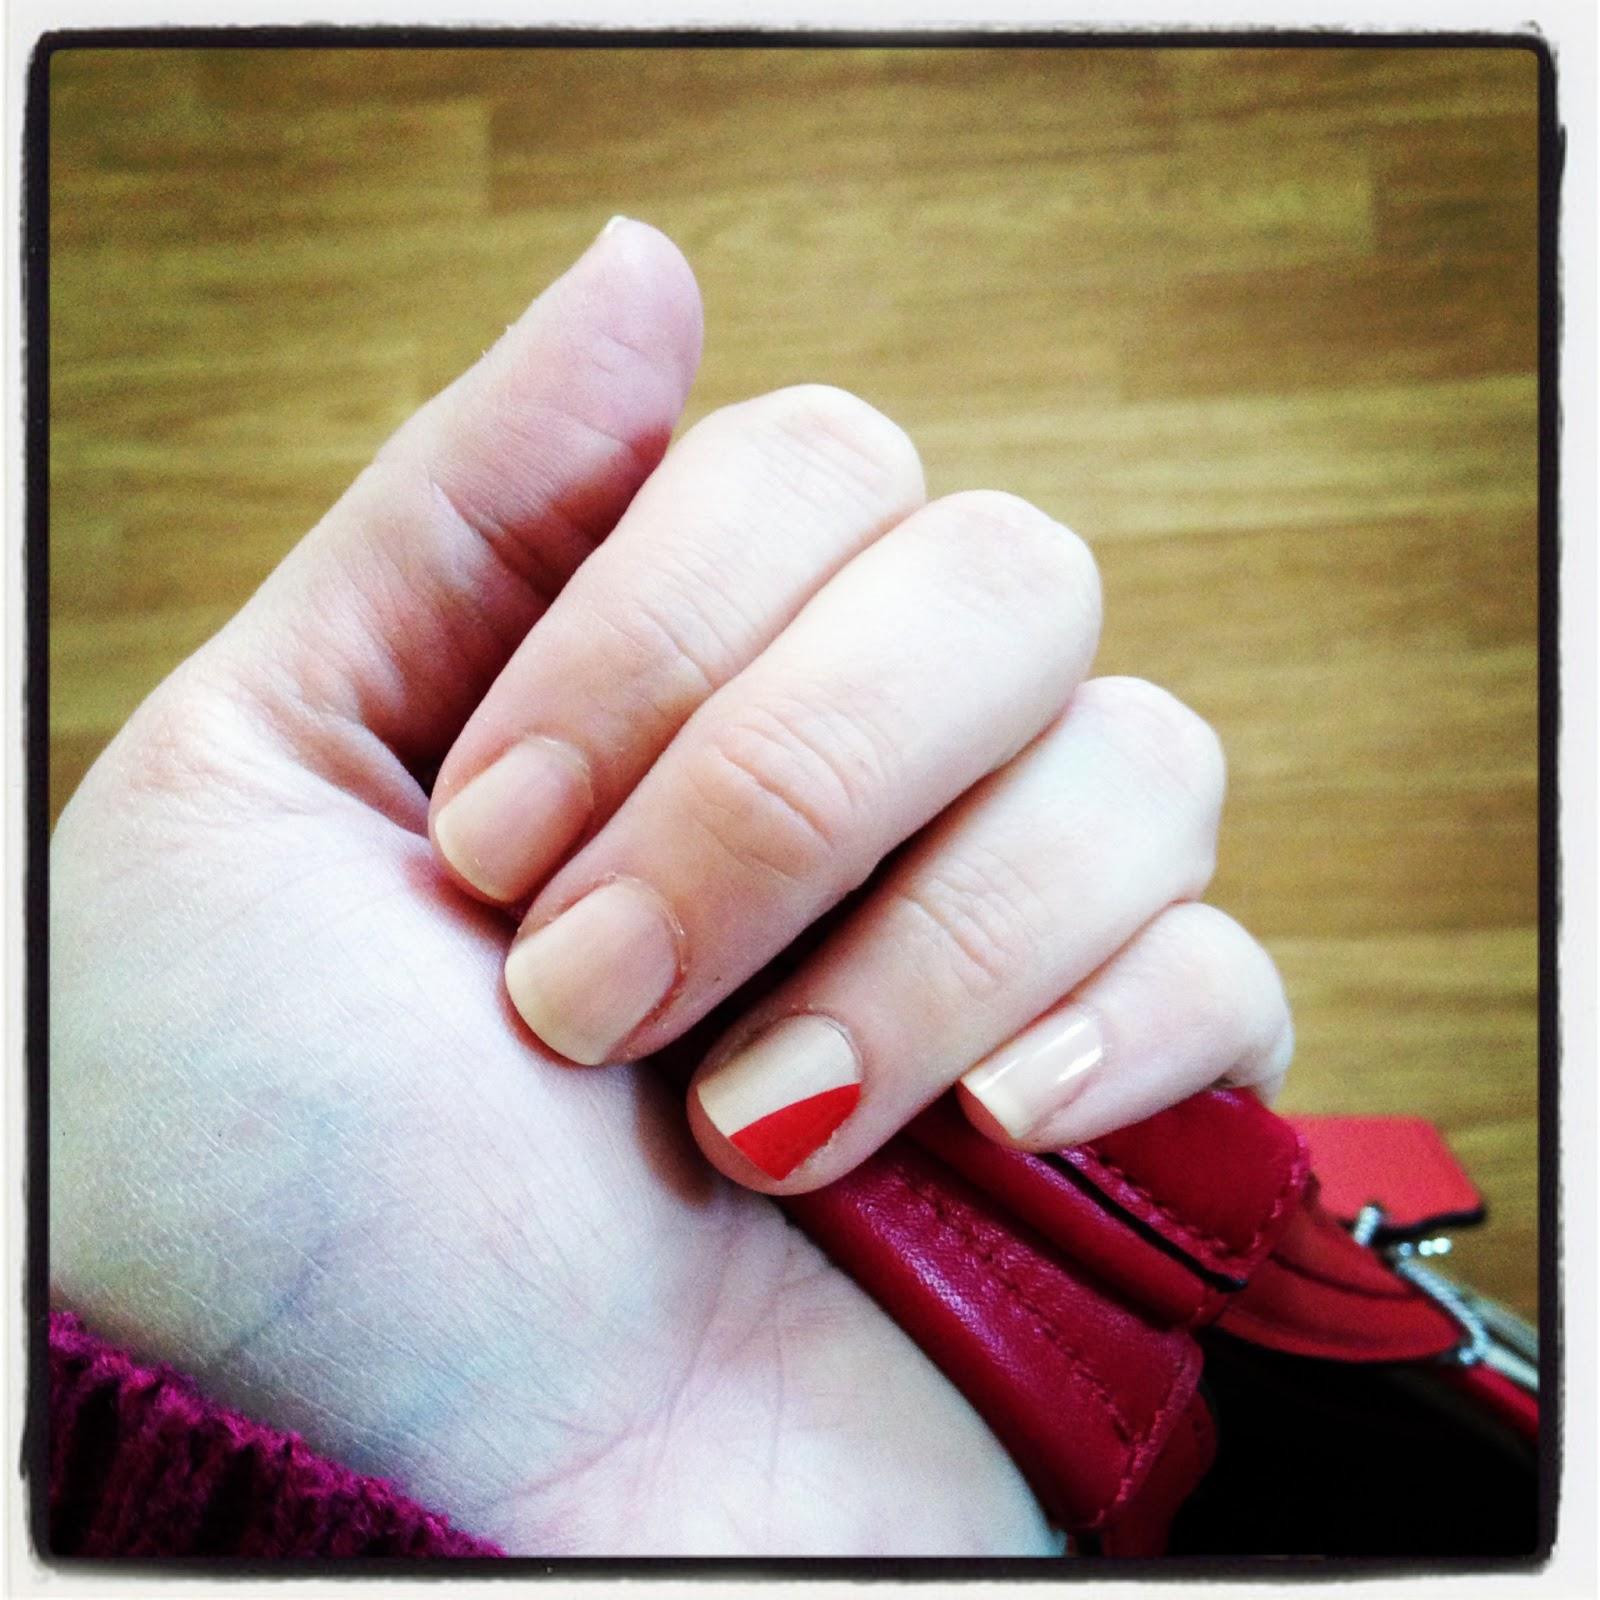 itty bits: jamberry nail wraps